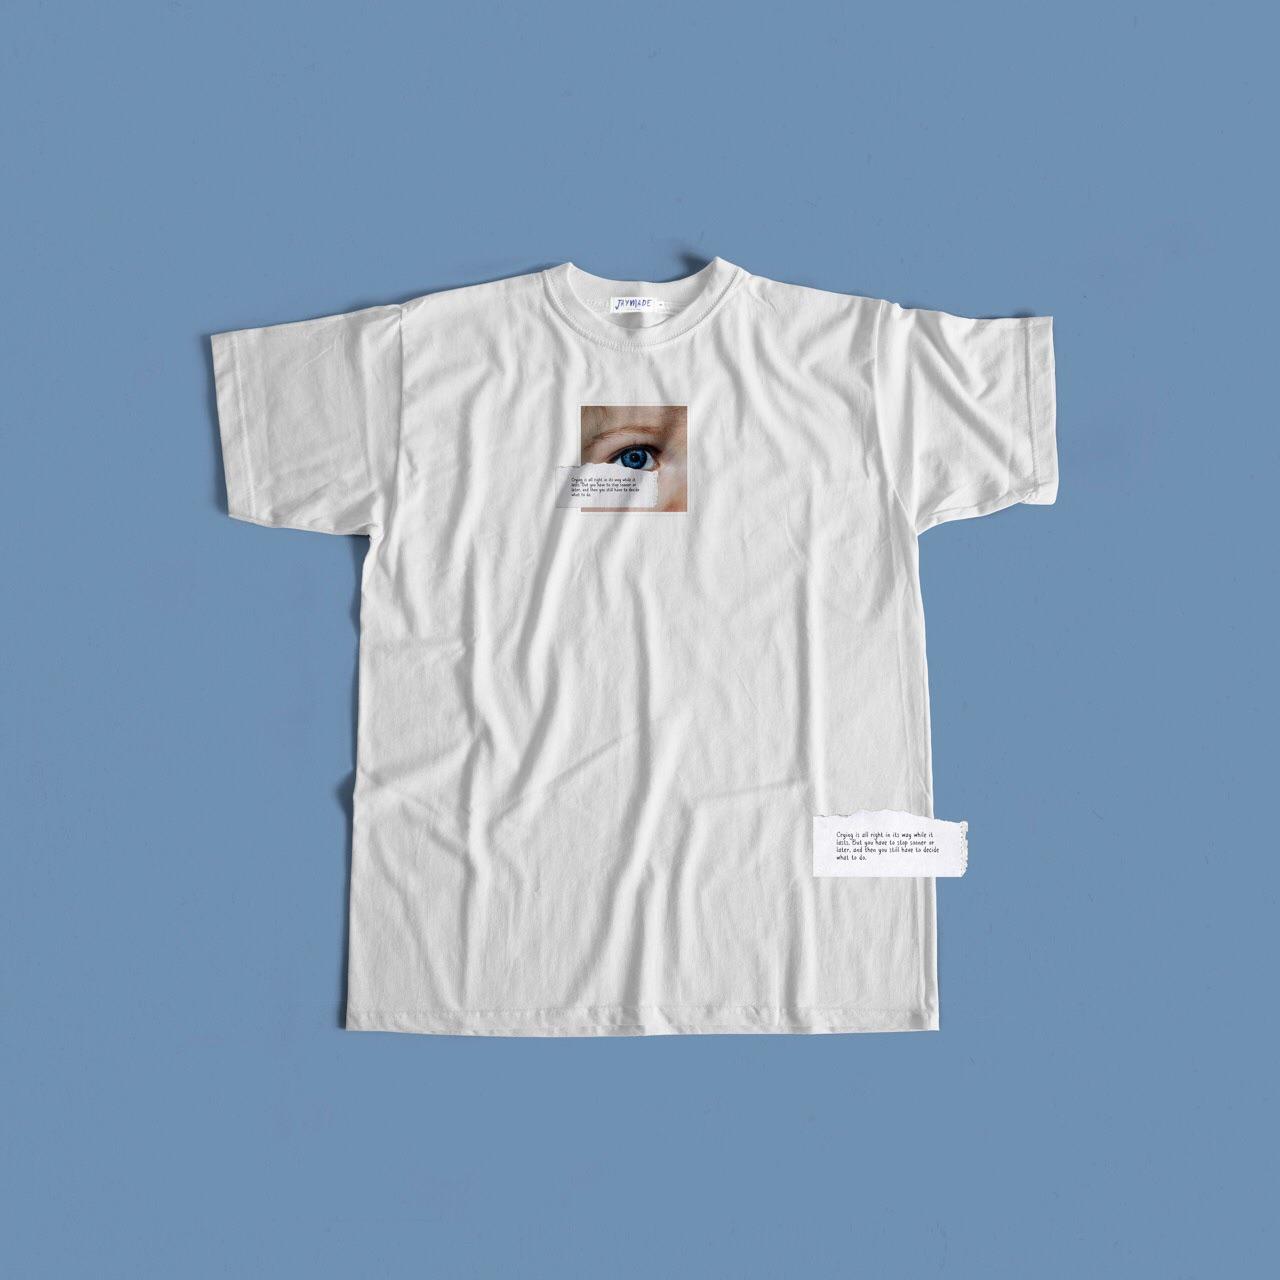 JAYMADE,Tshirt,เสื้อยืด